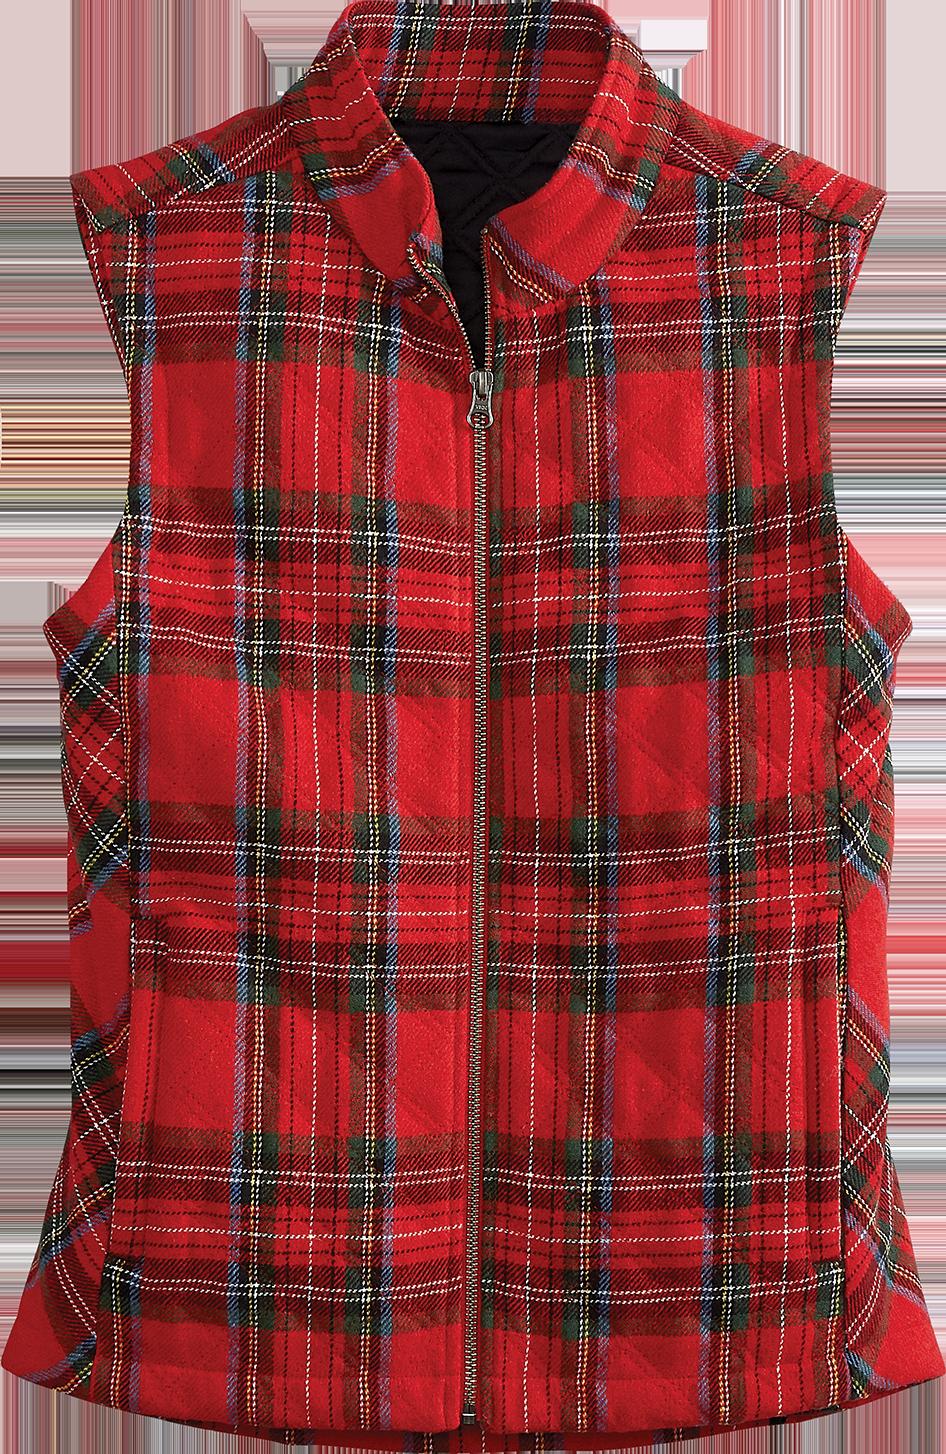 Women's Quilted Tartan Plaid Vest